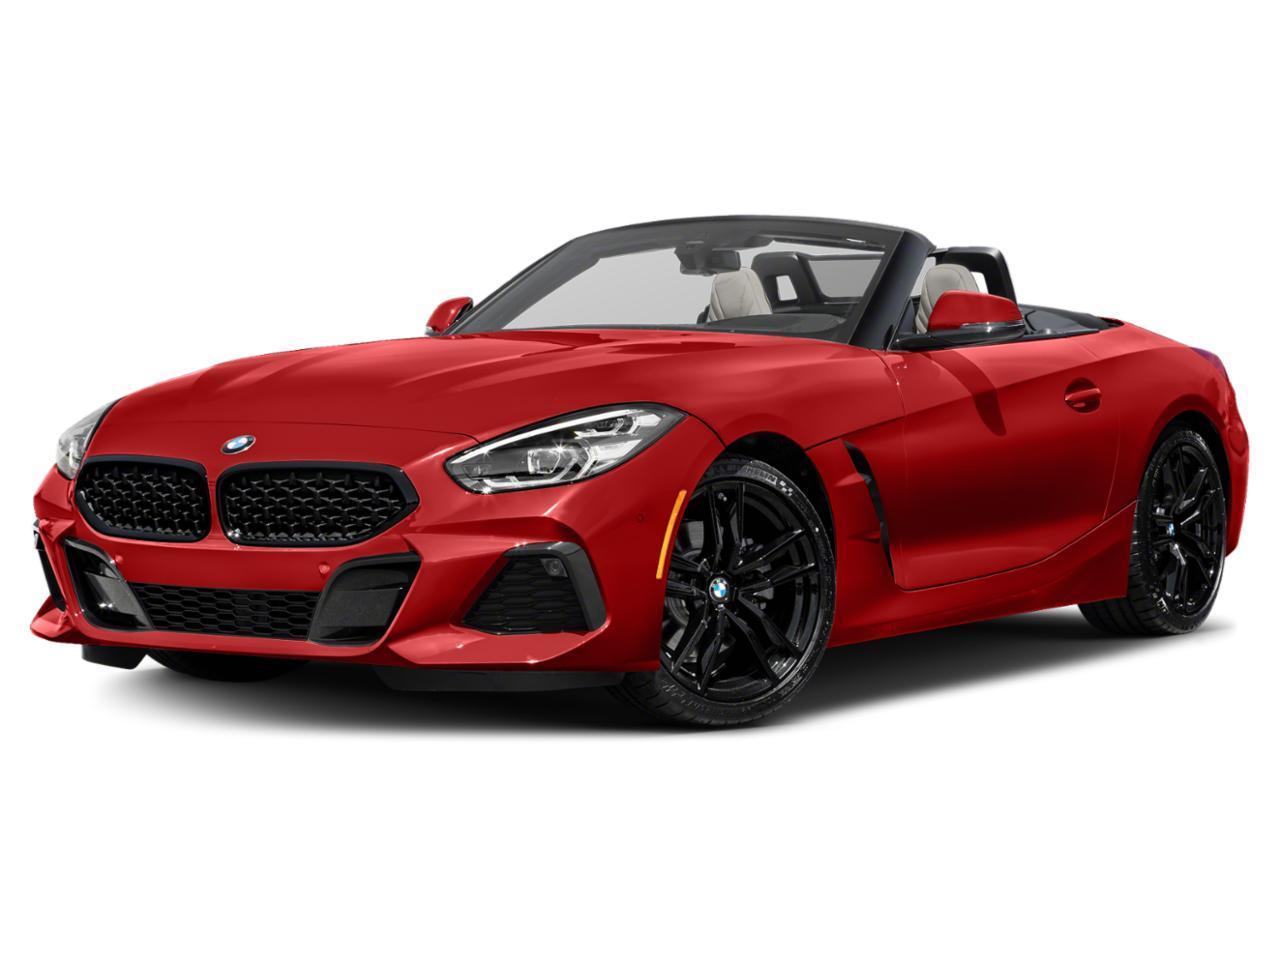 2022 BMW Z4 sDrive30i Vehicle Photo in PLANO, TX 75024-3599